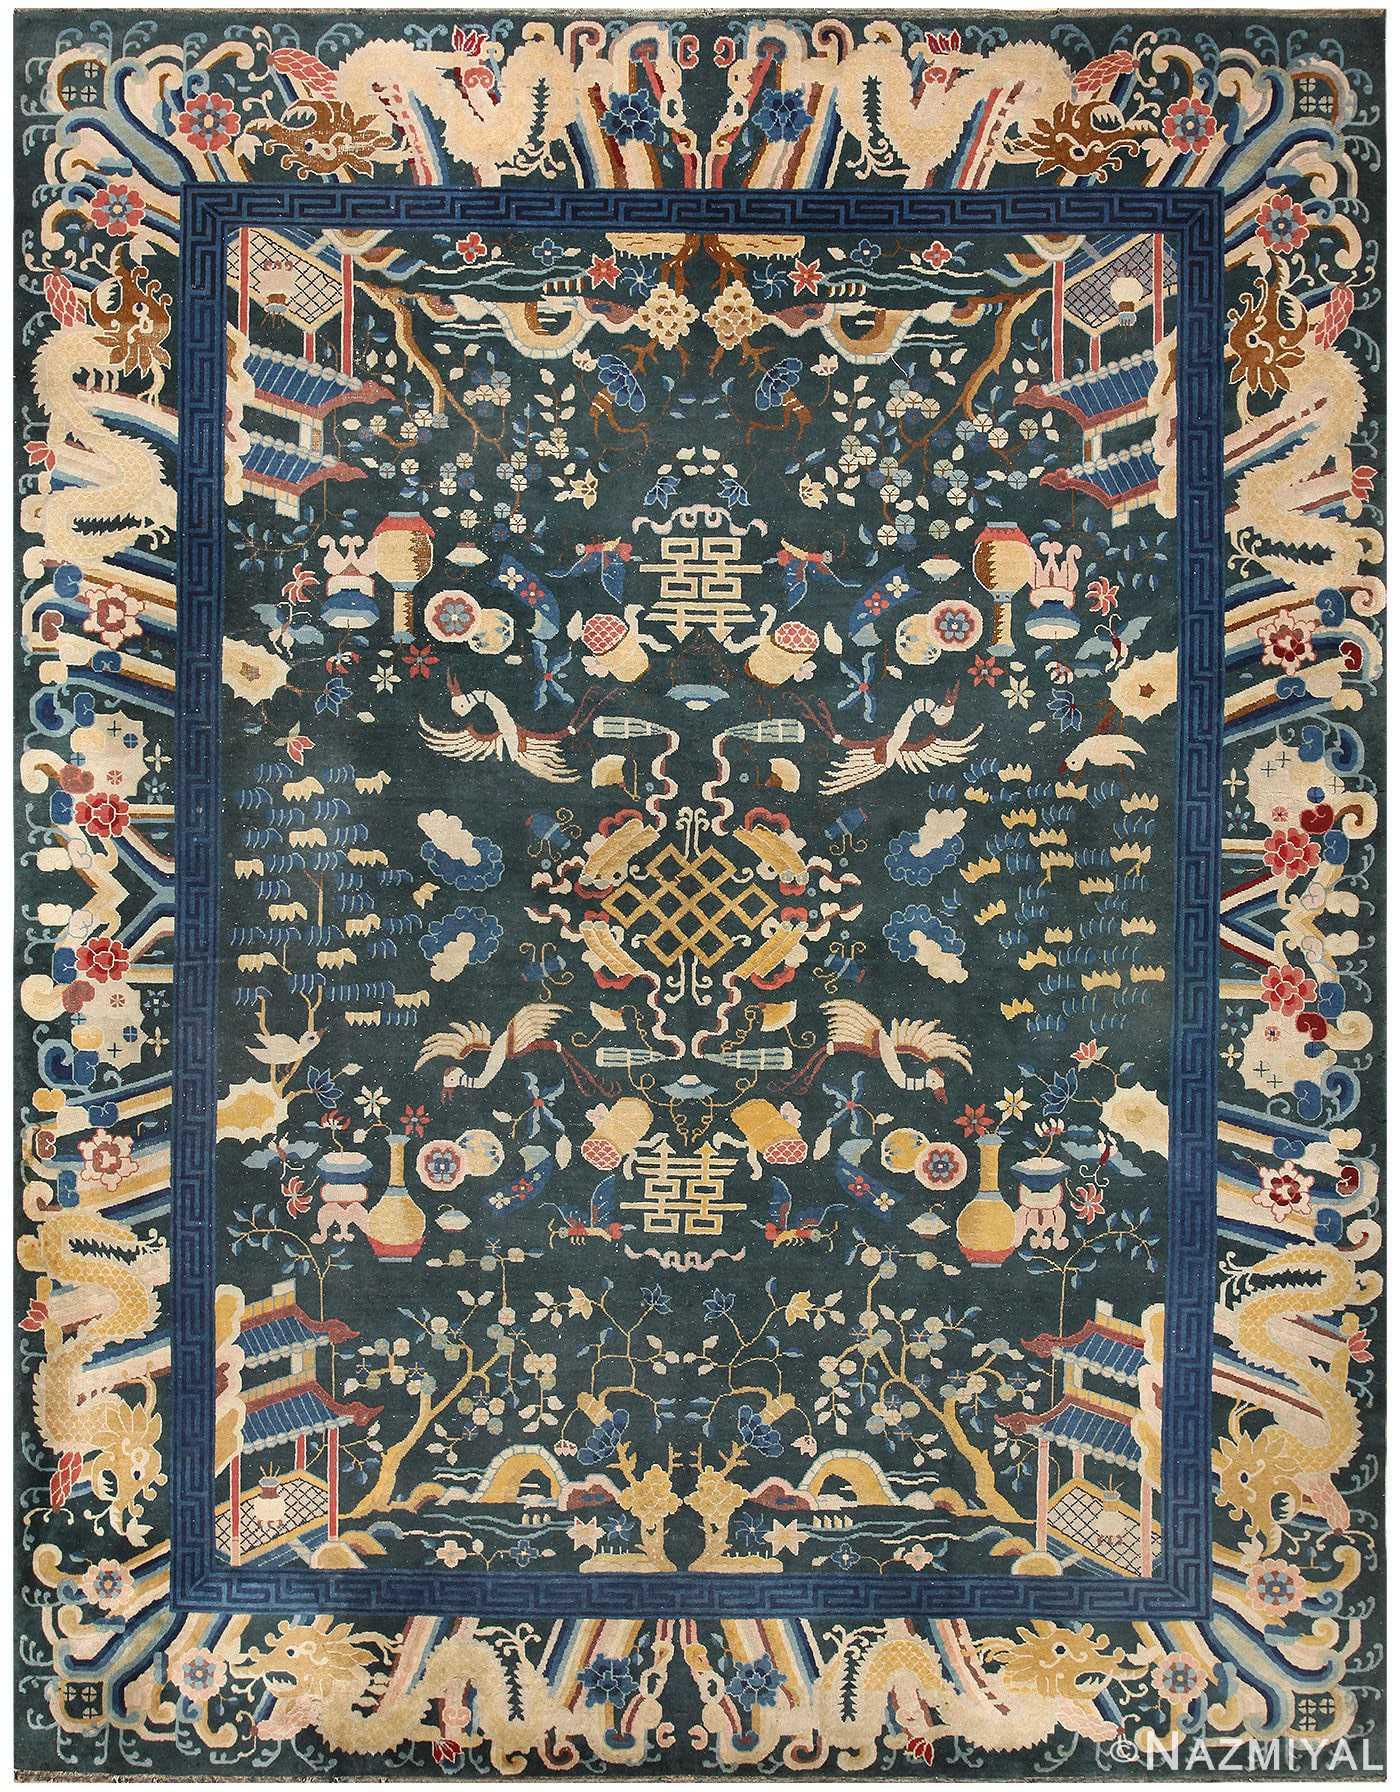 Antique Chinese Animal Rug 48430 Detail/Large View